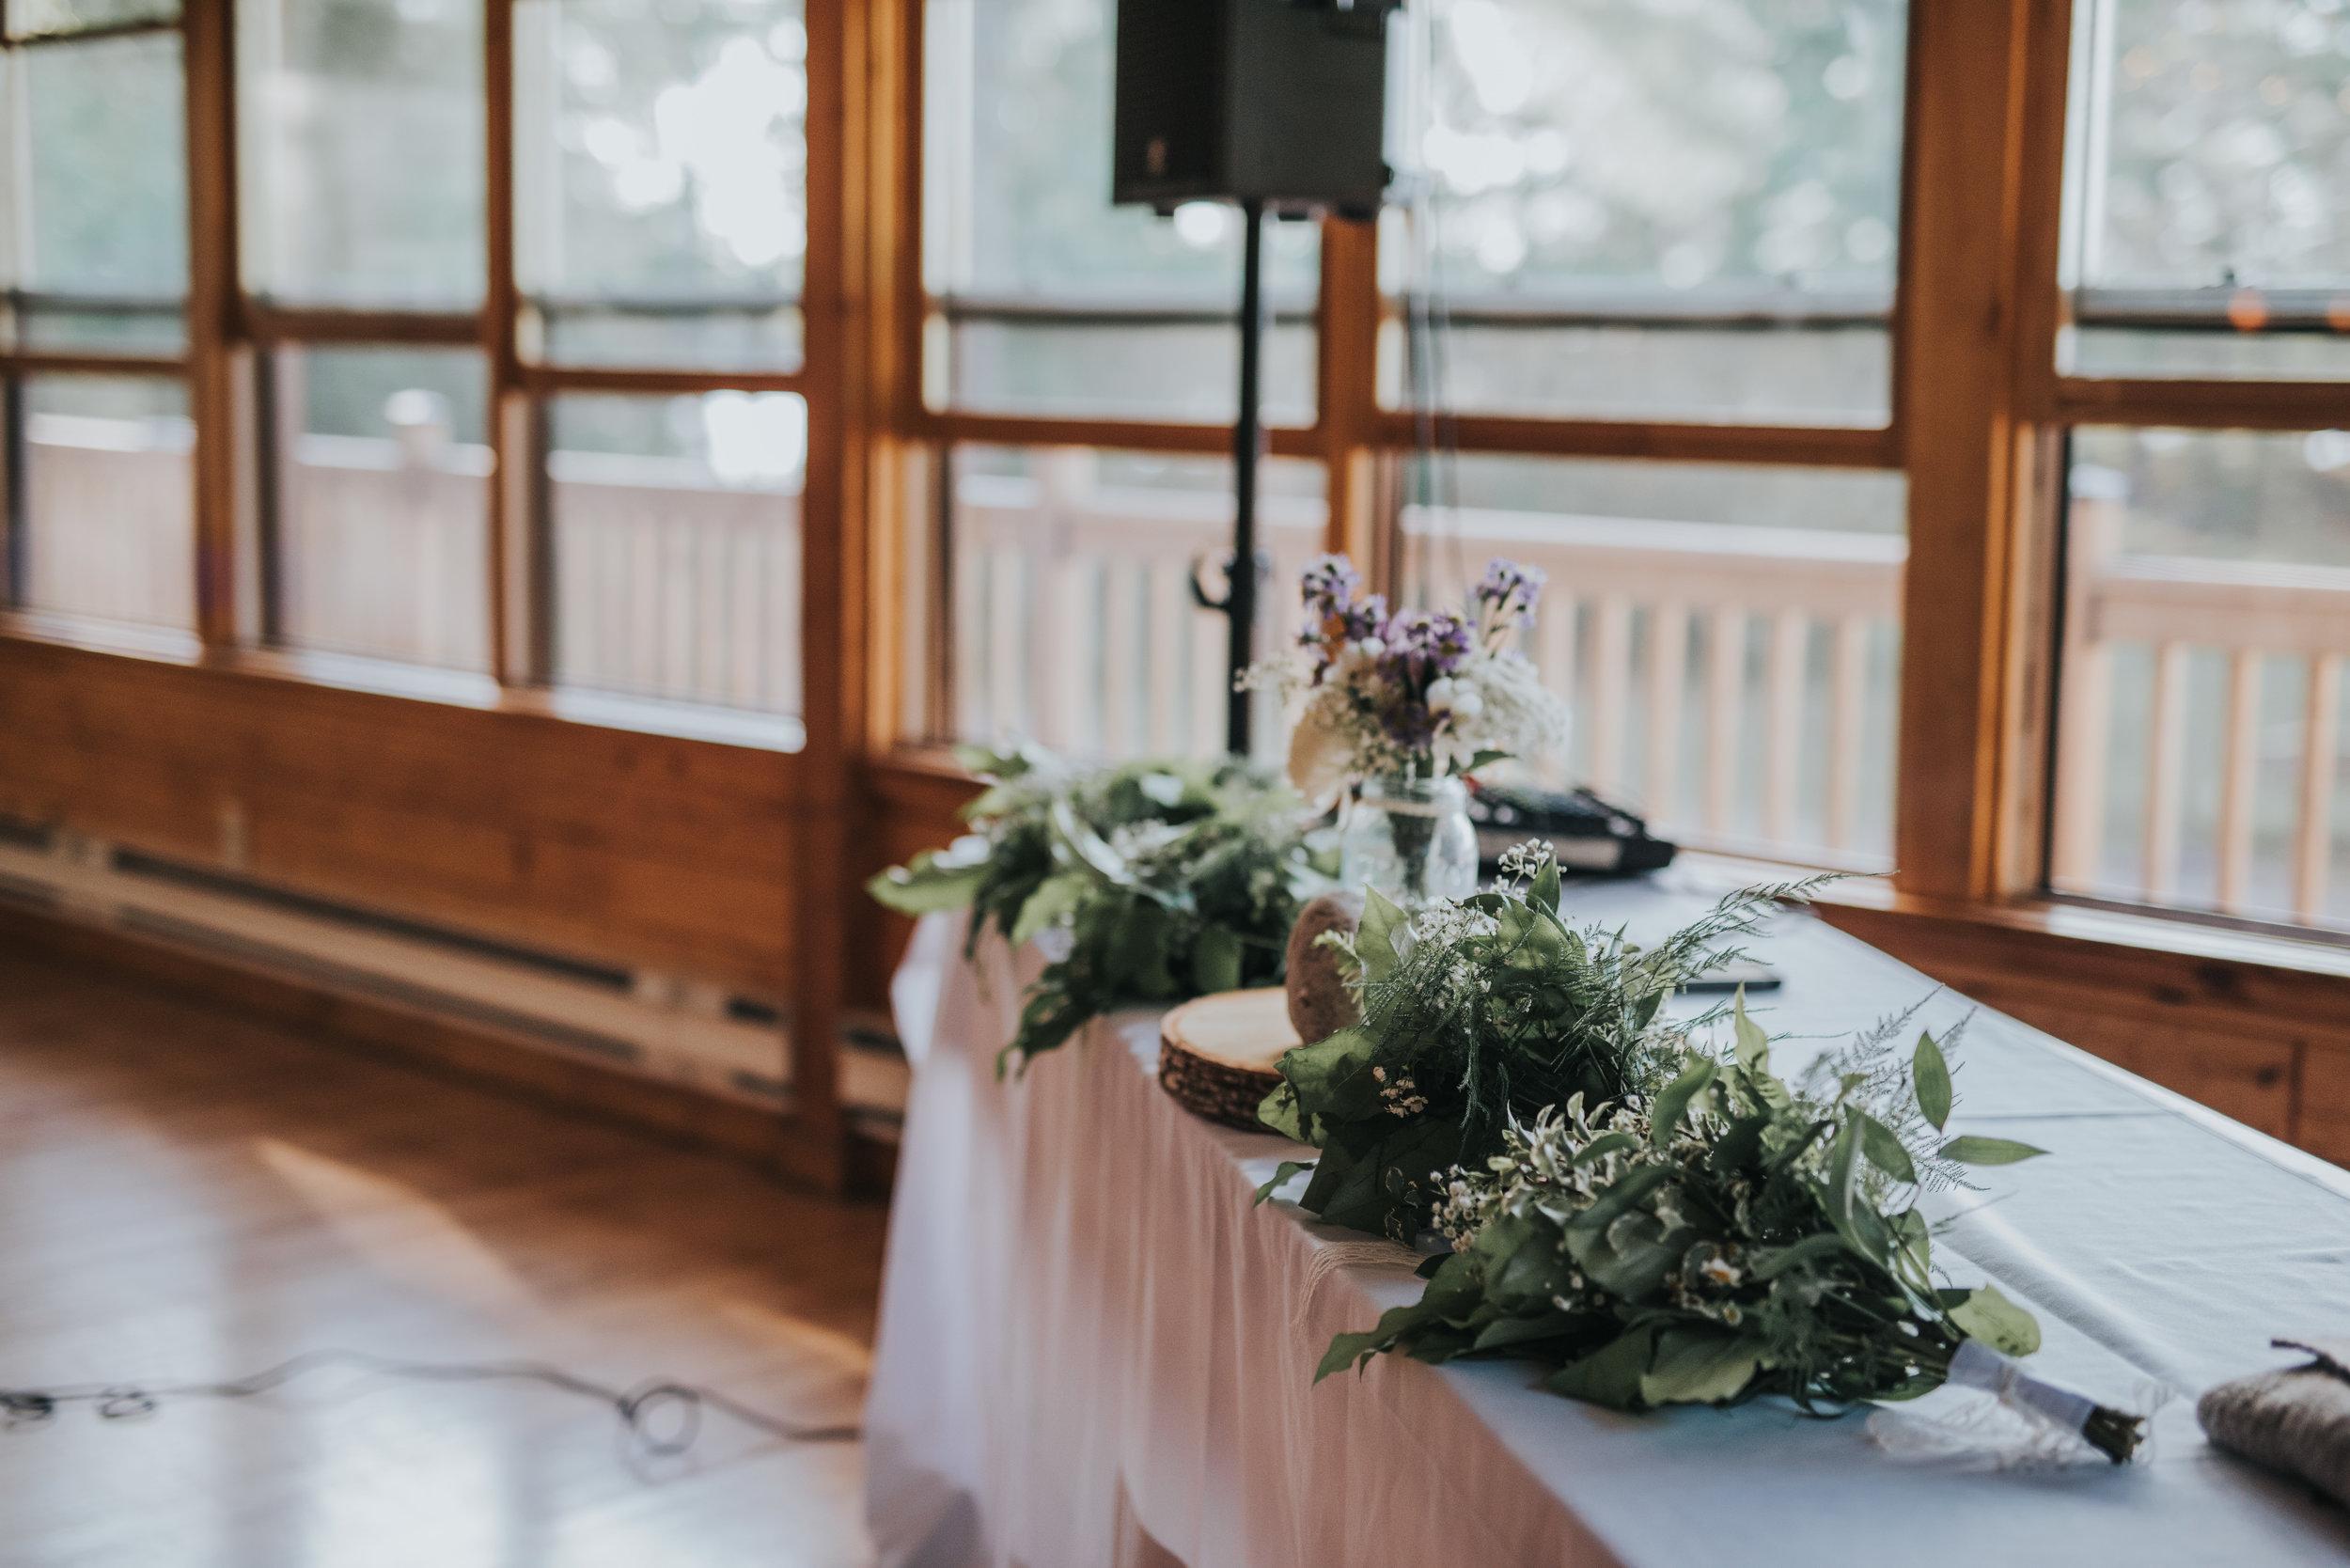 bridal-party-bouquets-rustic-cabin-wedding-toronto-bohemian-boho-outdoor-summer-wedding-documentary-wedding-photography-by-willow-birch-photo.jpg